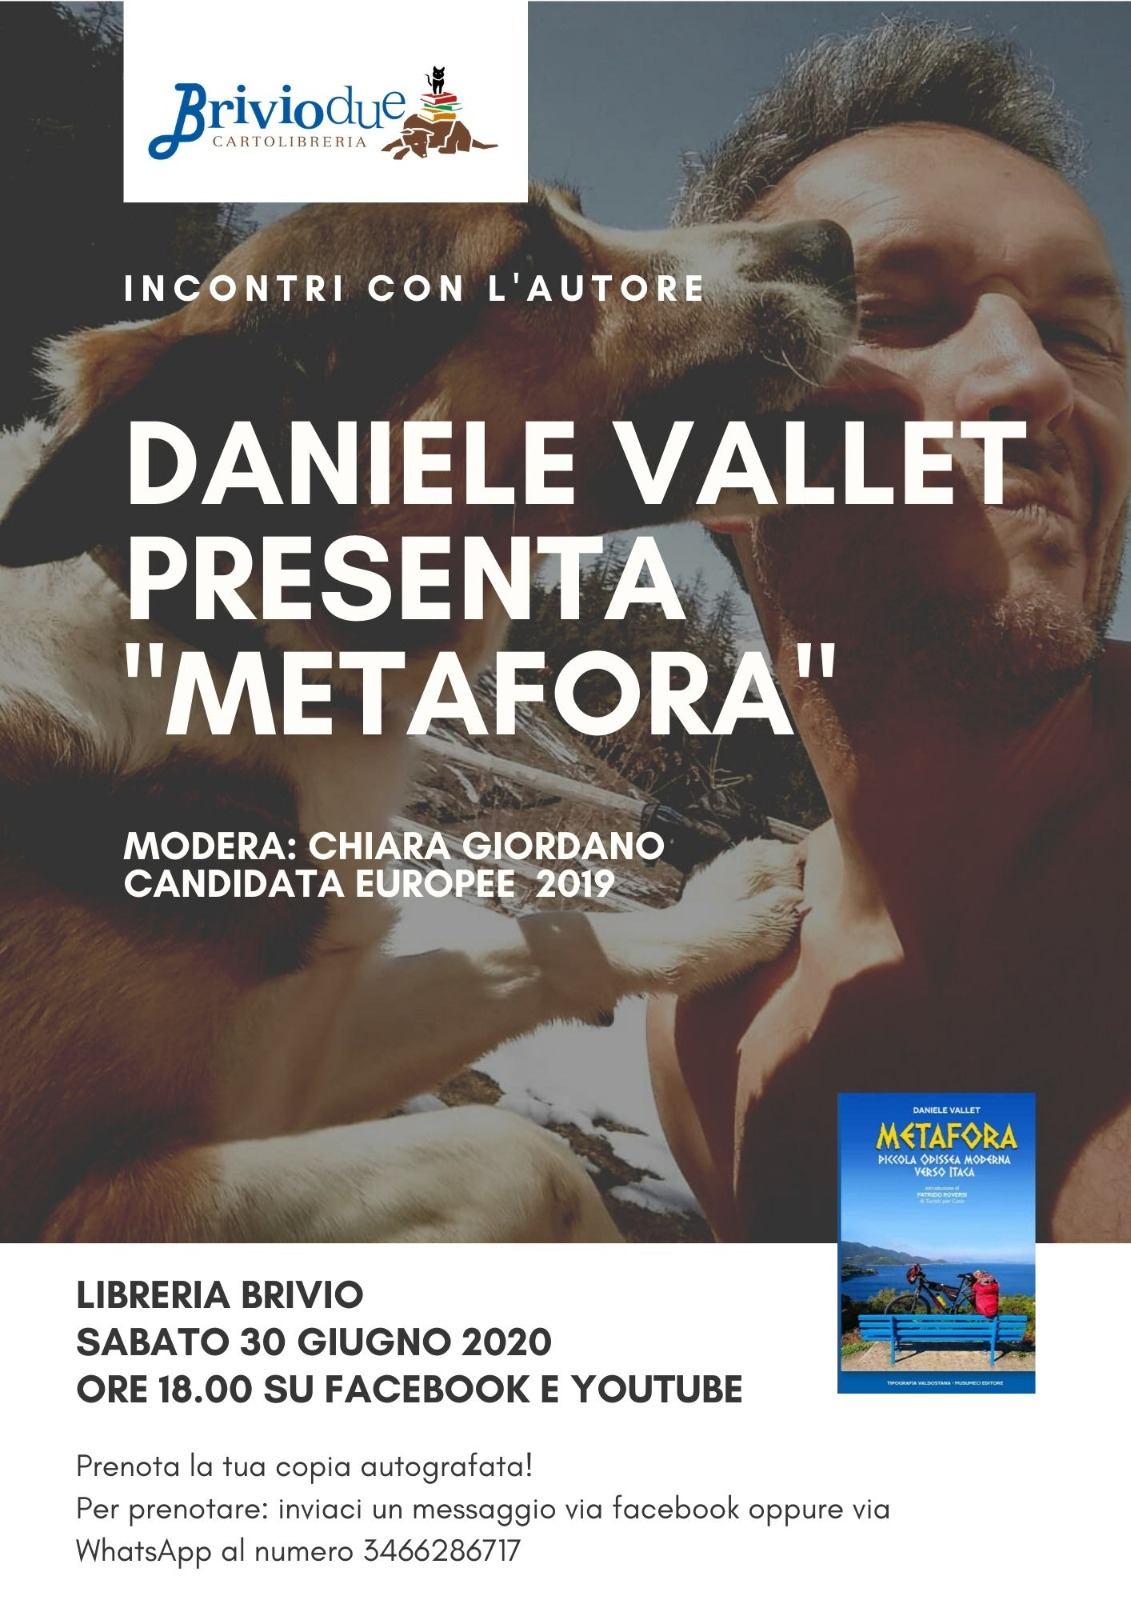 Daniele Vallet presenta Metafora